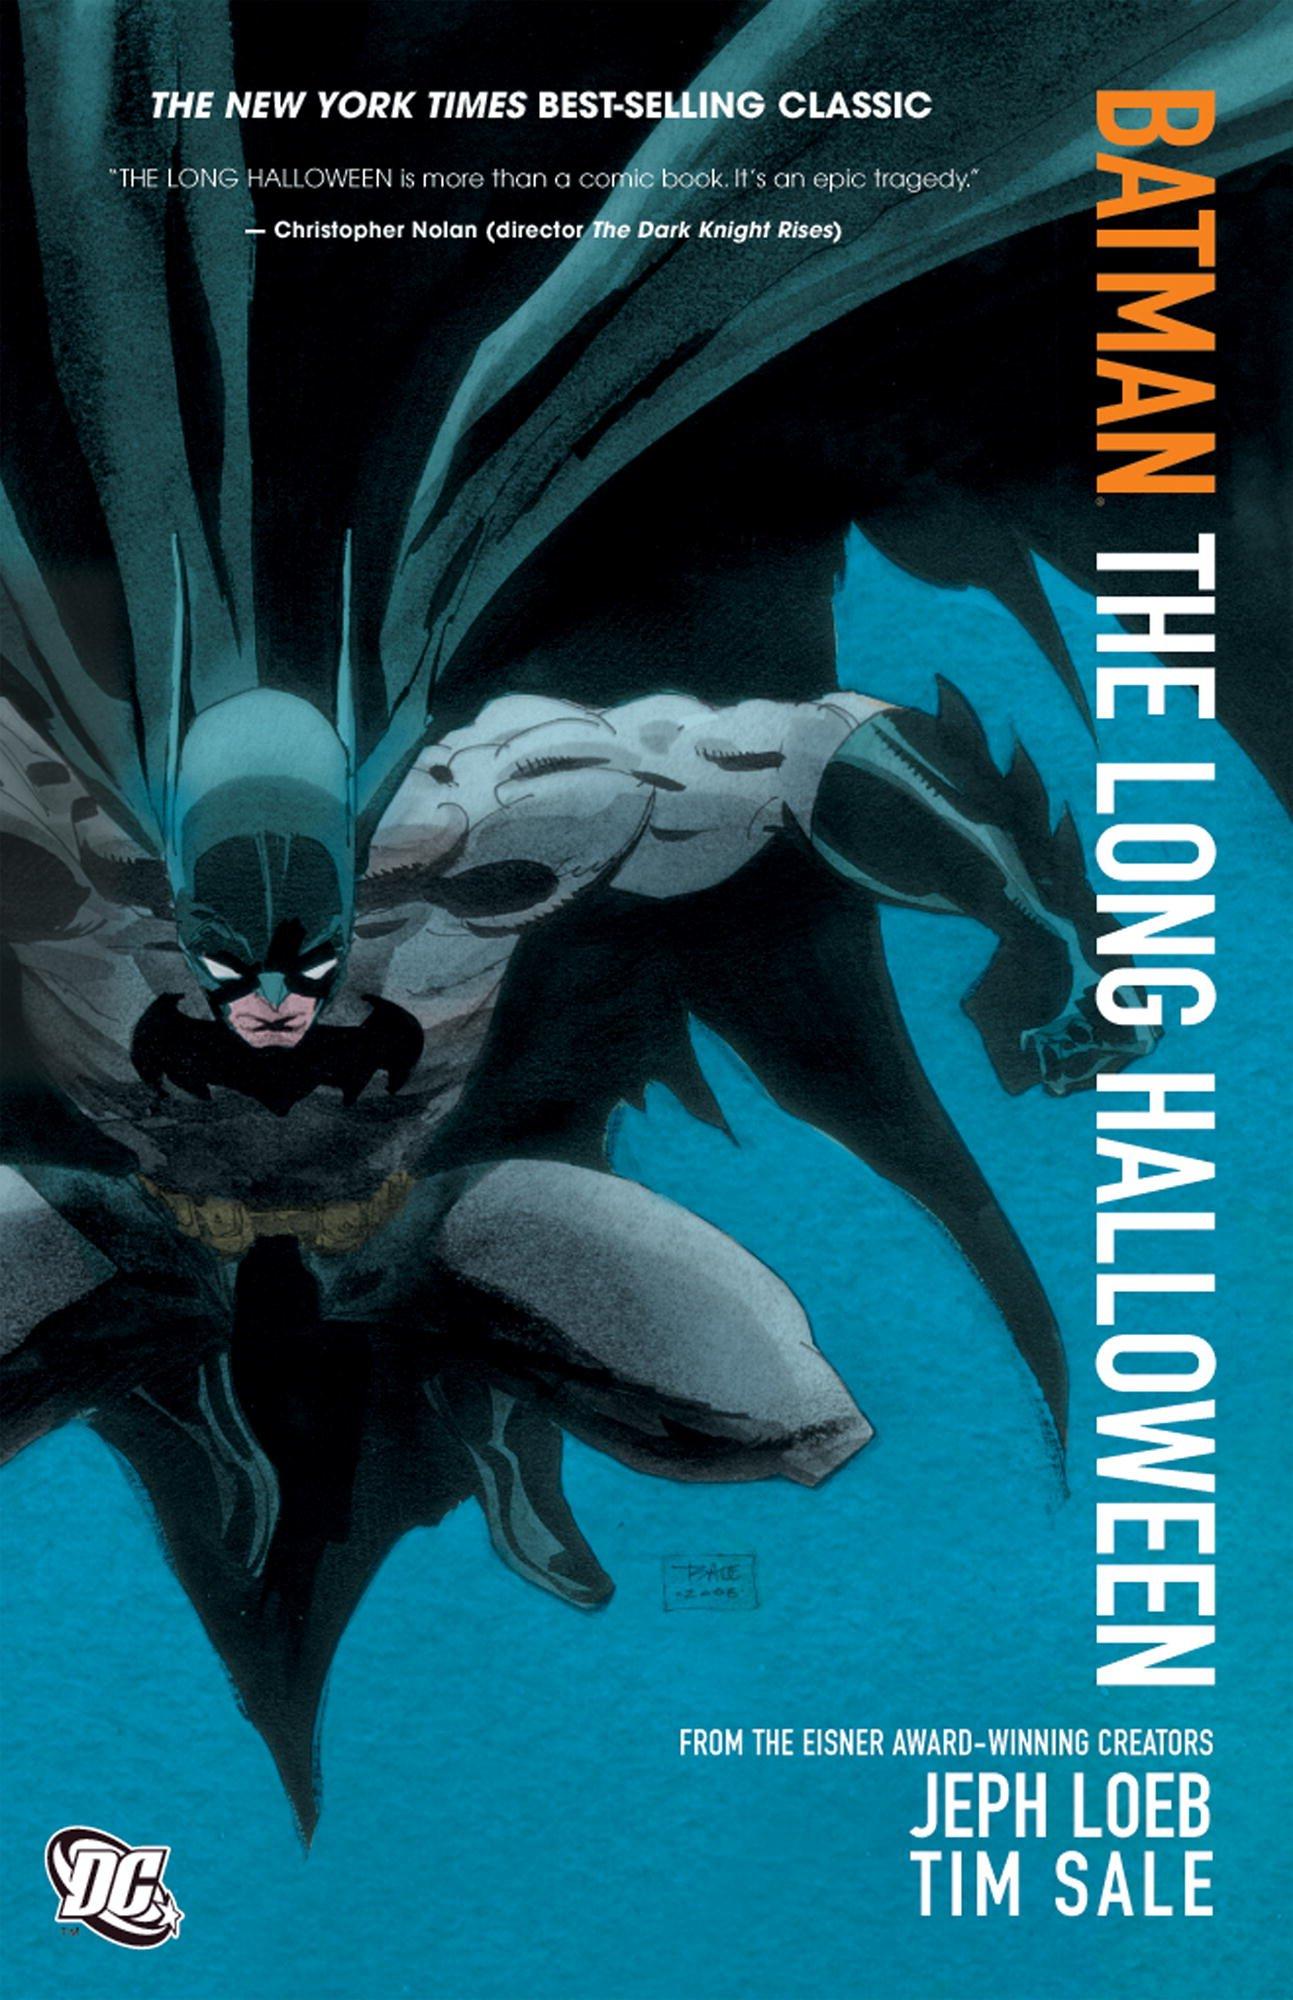 Amazon.com: Batman: The Long Halloween (9781401232597): Jeph Loeb ...